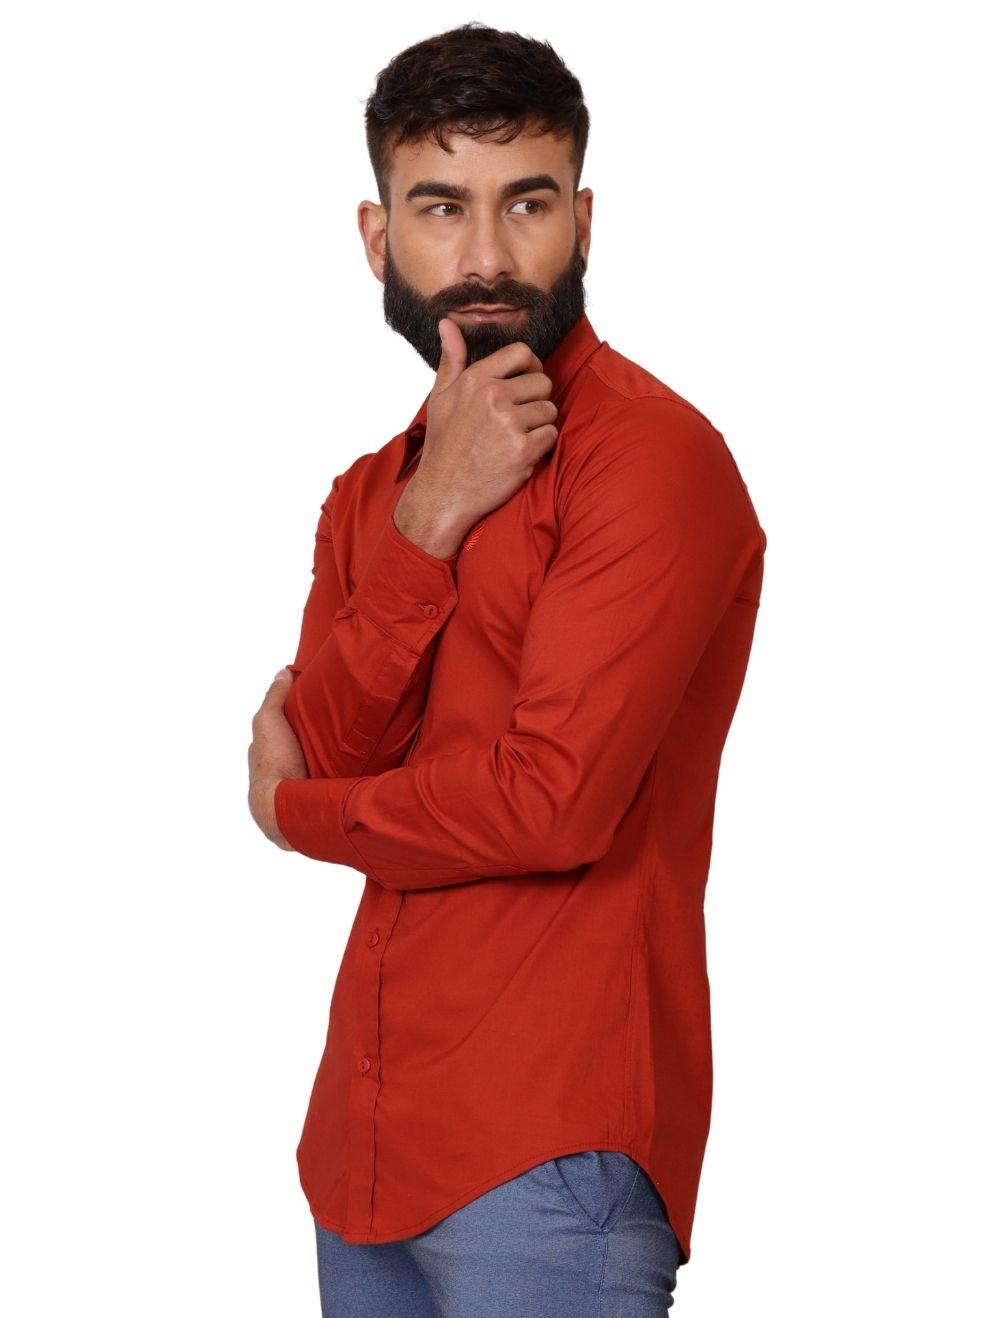 Camisa Masculina Slim Manga Longa com Elastano Ferrugem